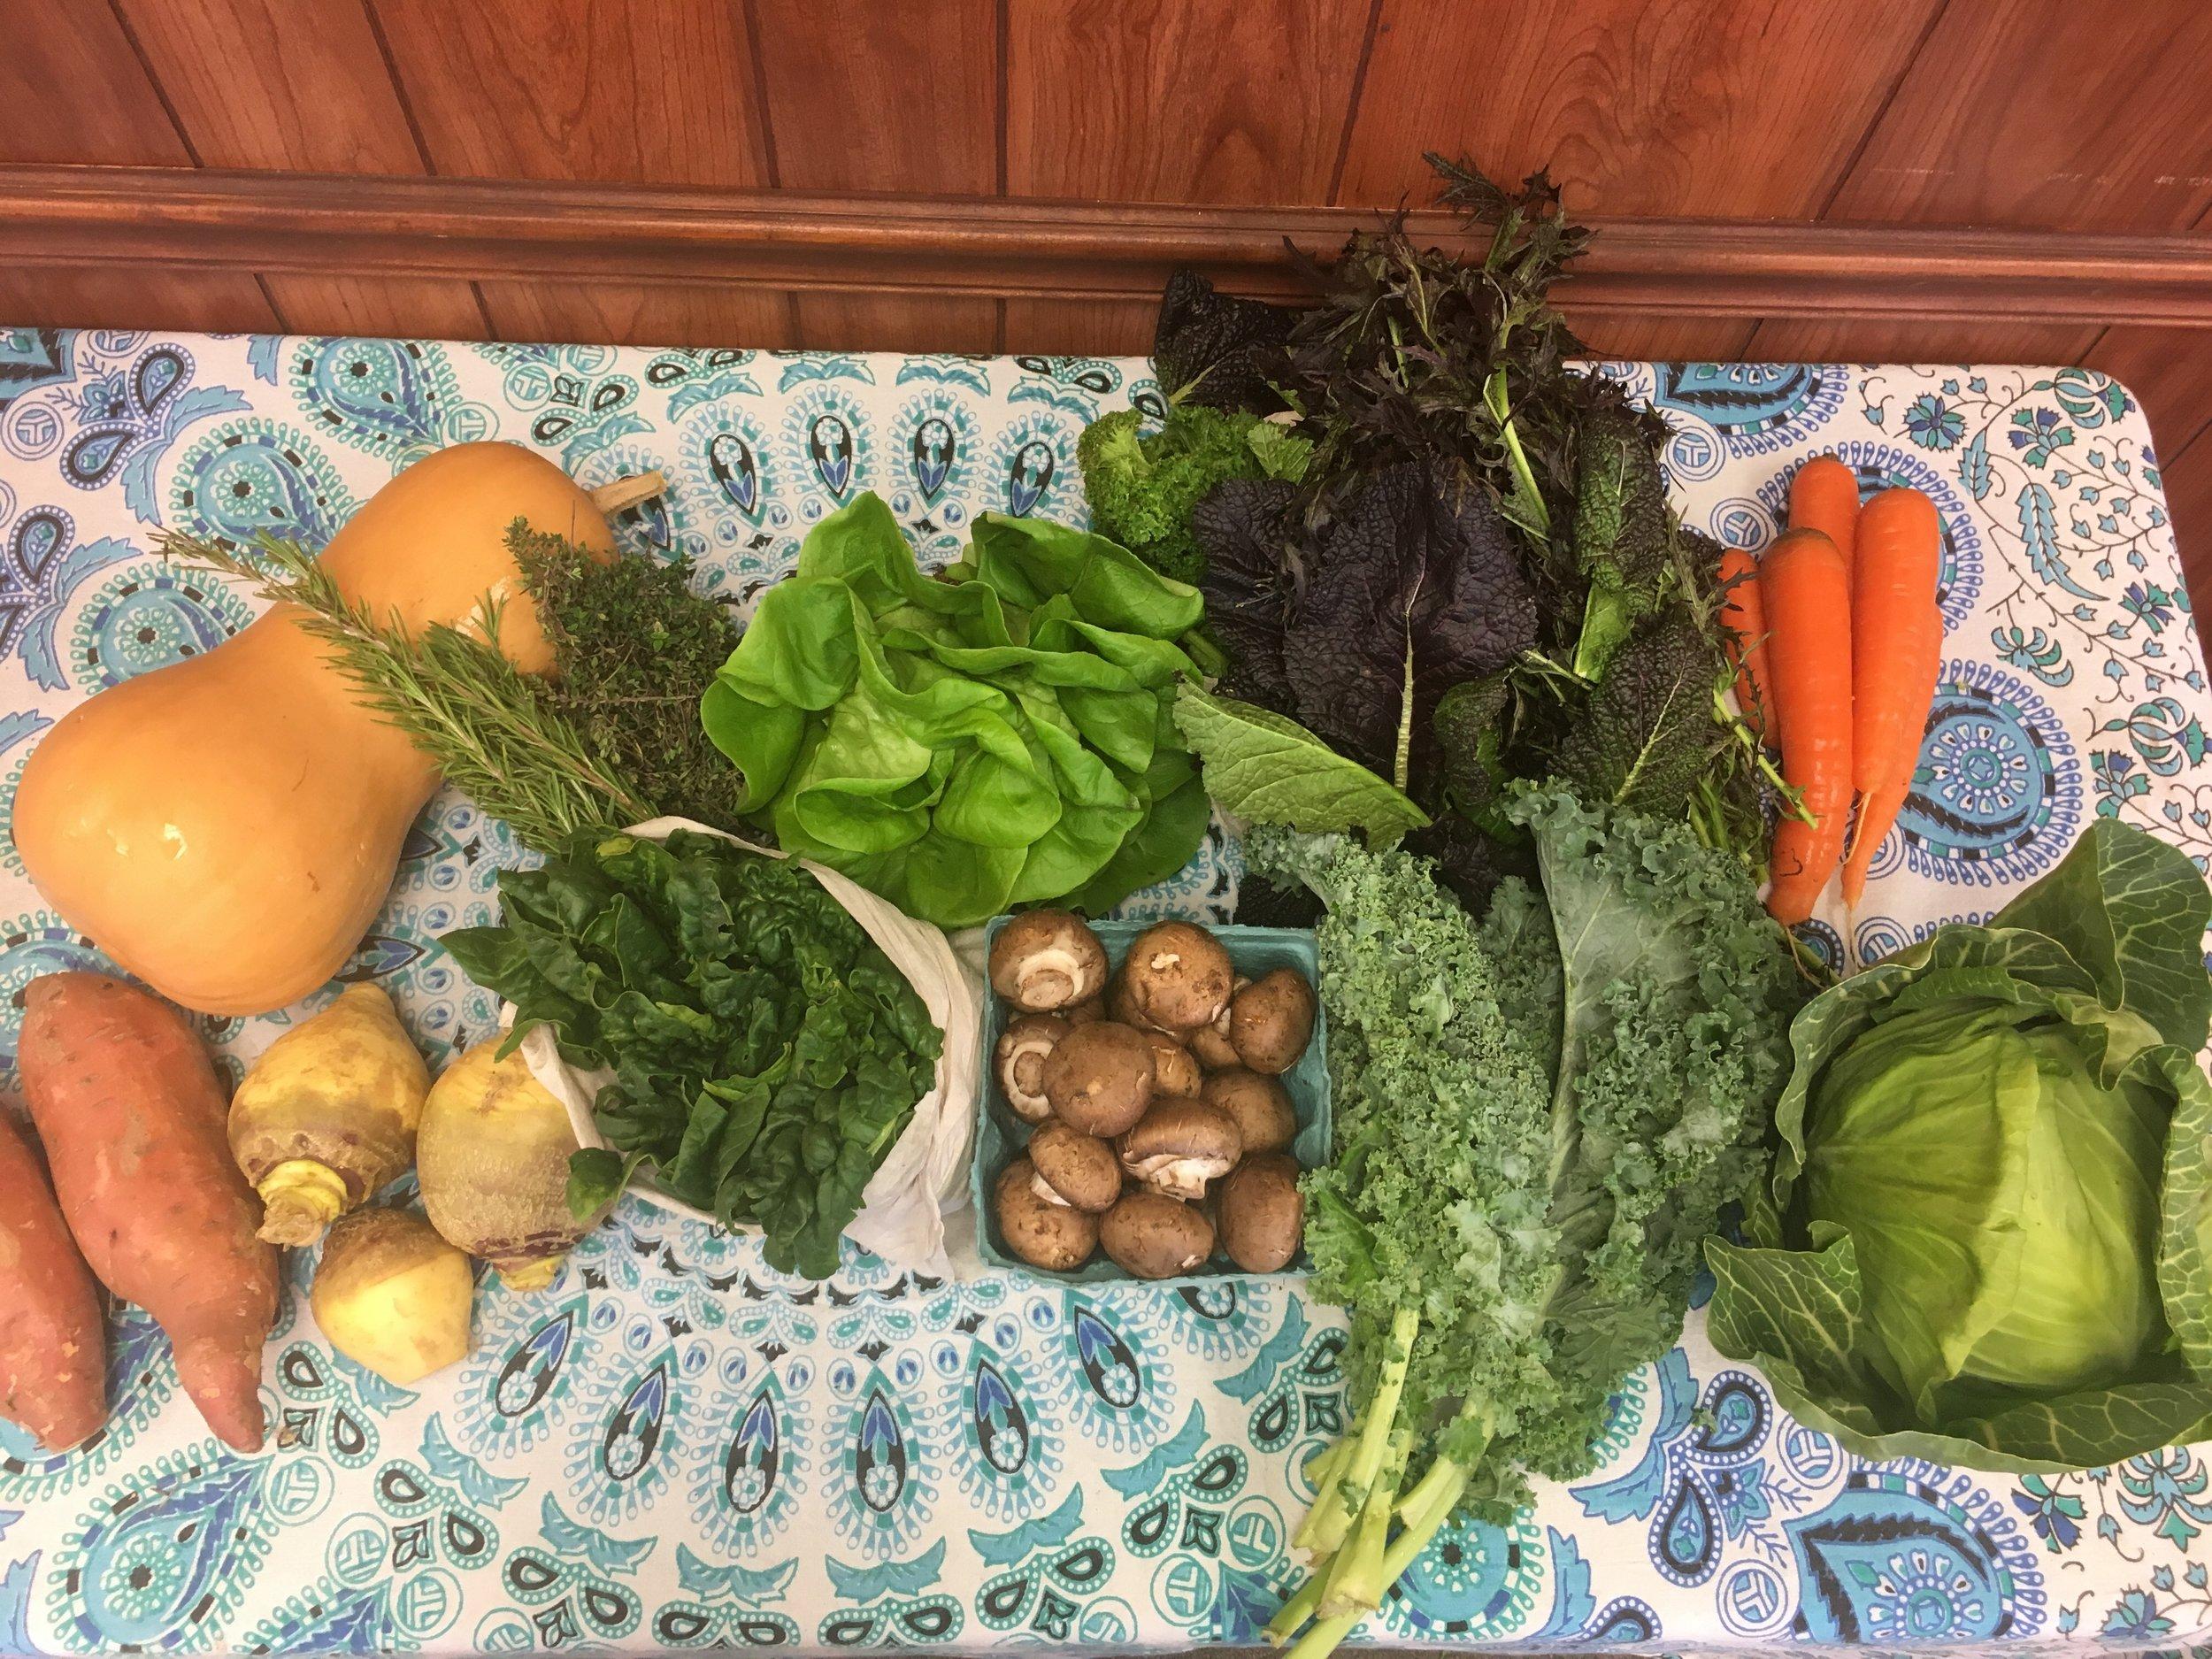 Spice of Life family- butternut squash, herbs, Bibb lettuce, mixed mustard greens, carrots, garnet sweet potatoes, rutabaga, spinach, cremini mushrooms, curly kale, green cabbage.